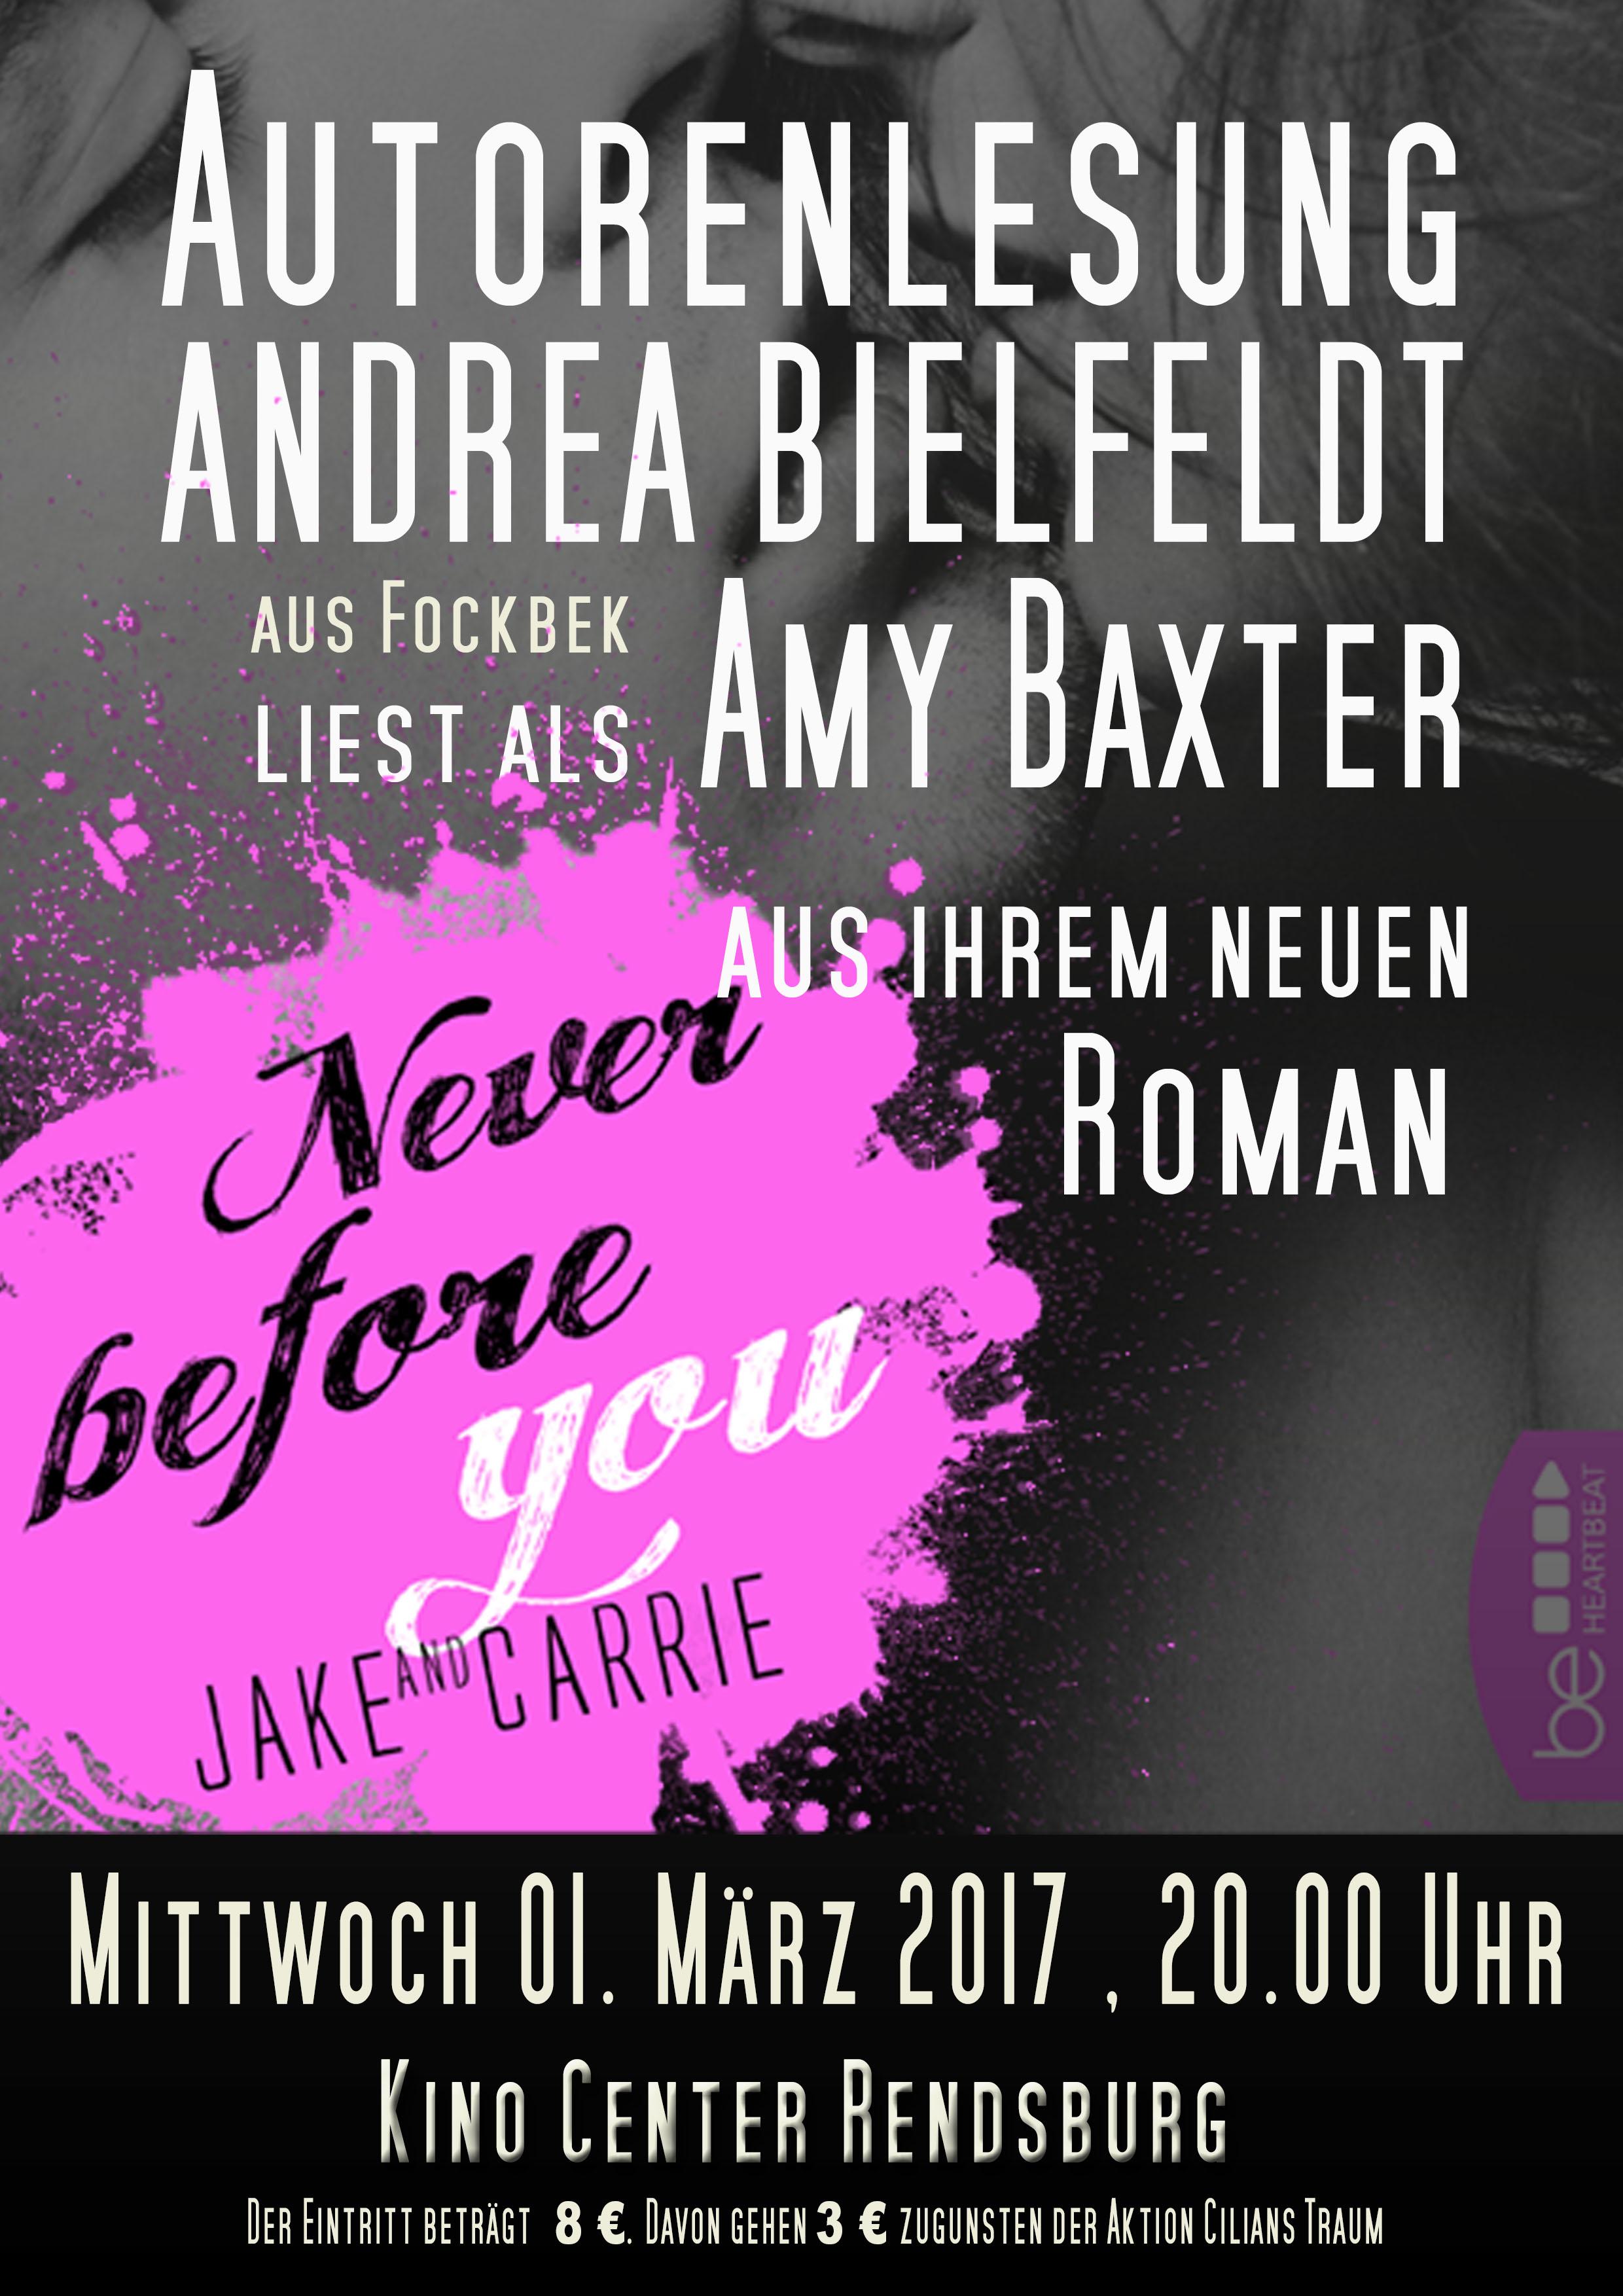 Lesung Kino Center Rendsburg Amy Baxter San Francisco Ink Cover Lübbe Verlag